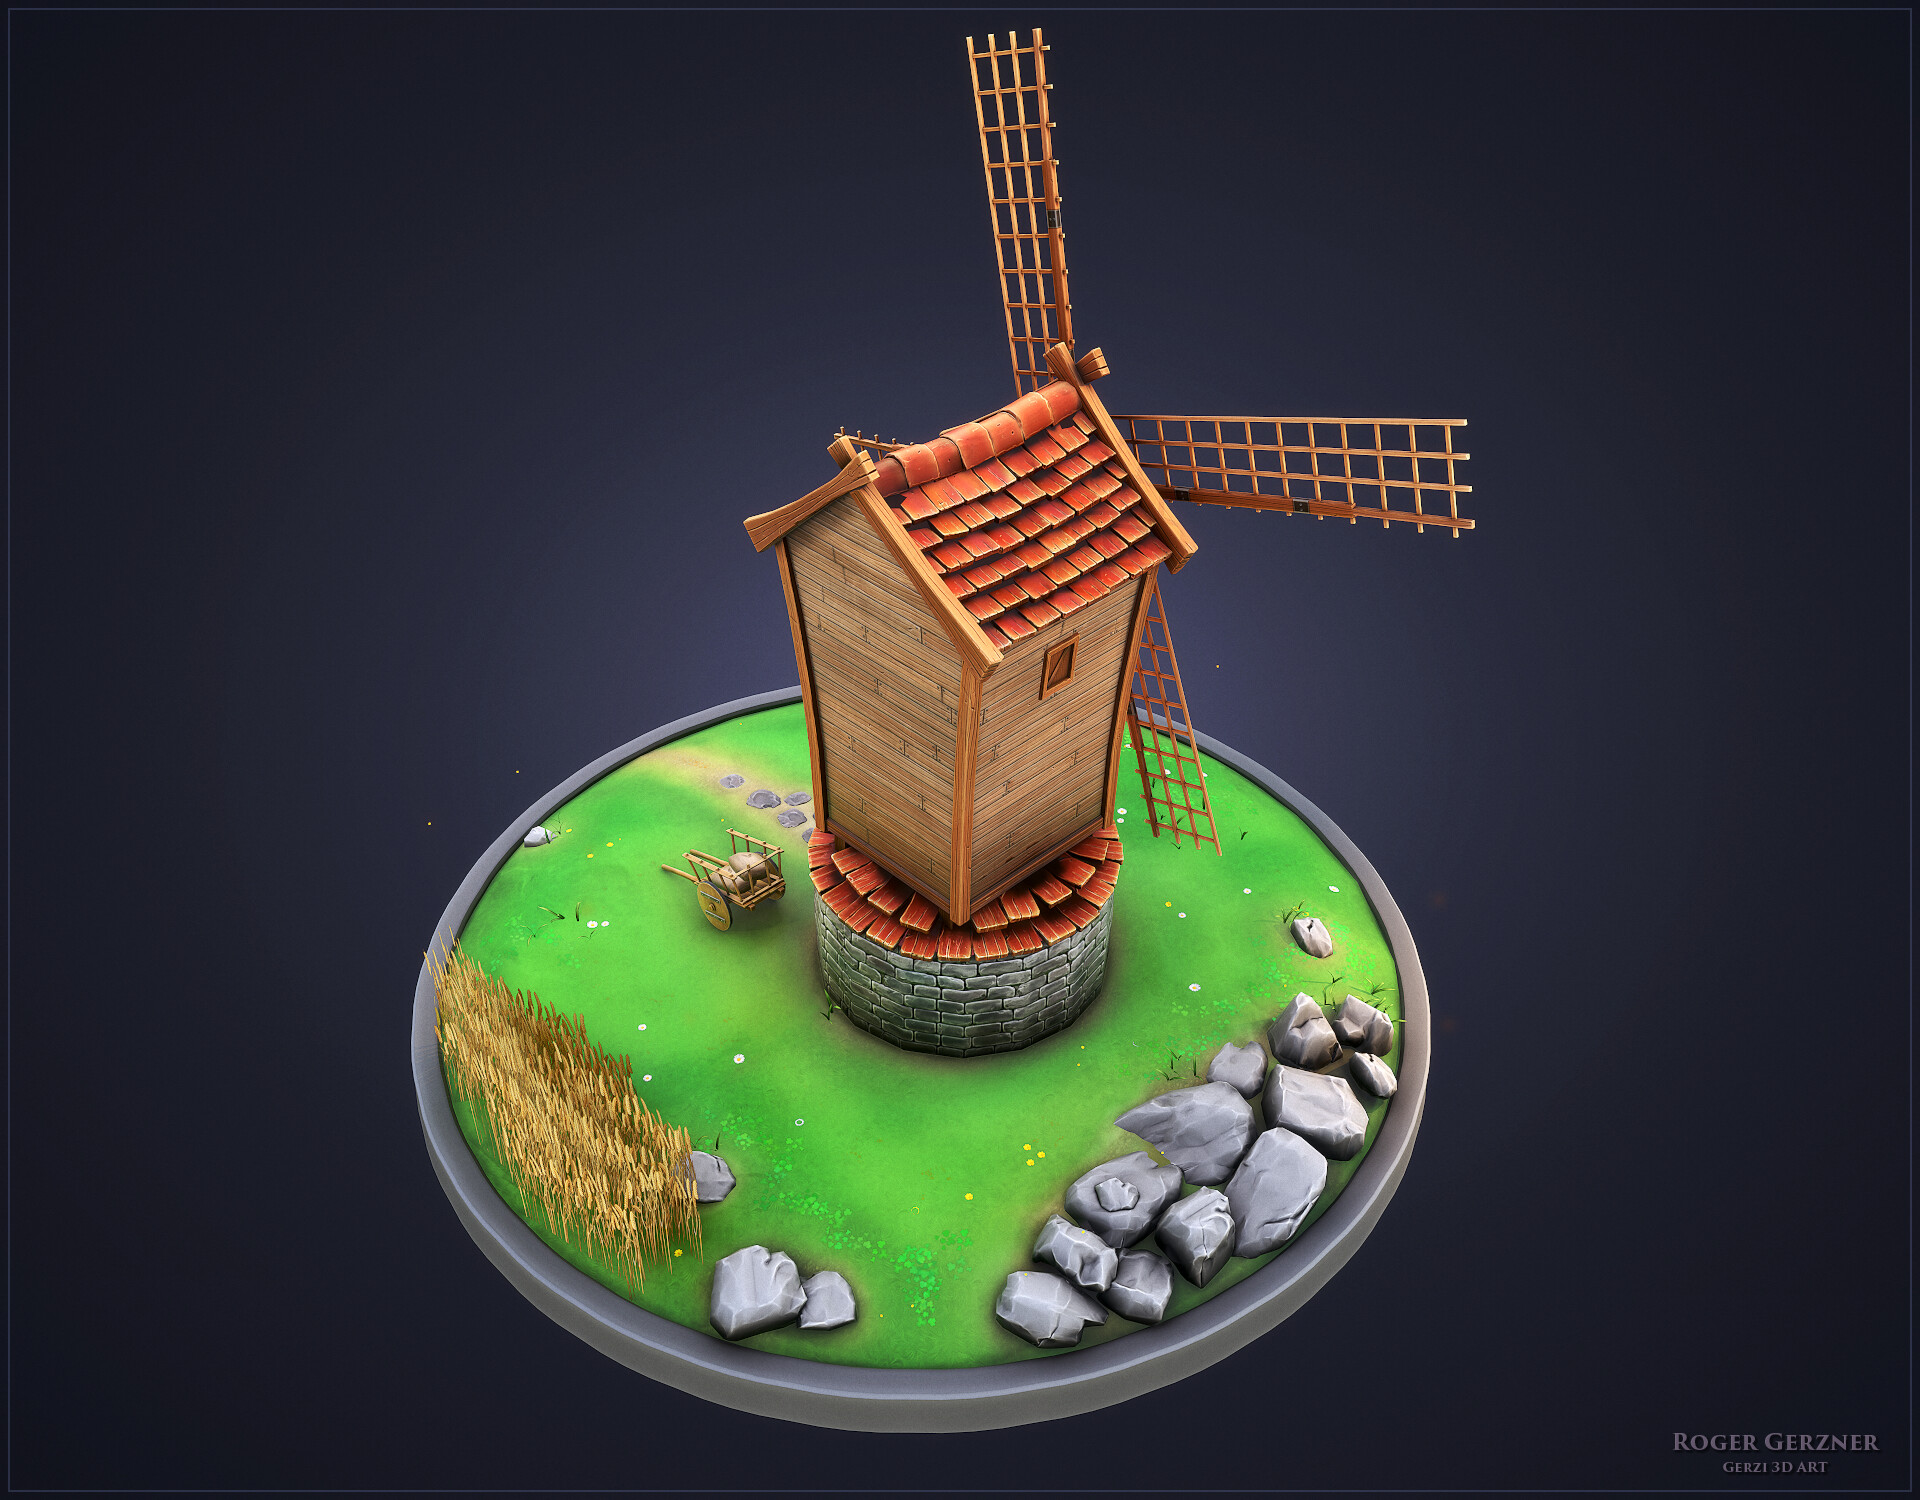 Roger gerzner rogergerzner windmill 01b